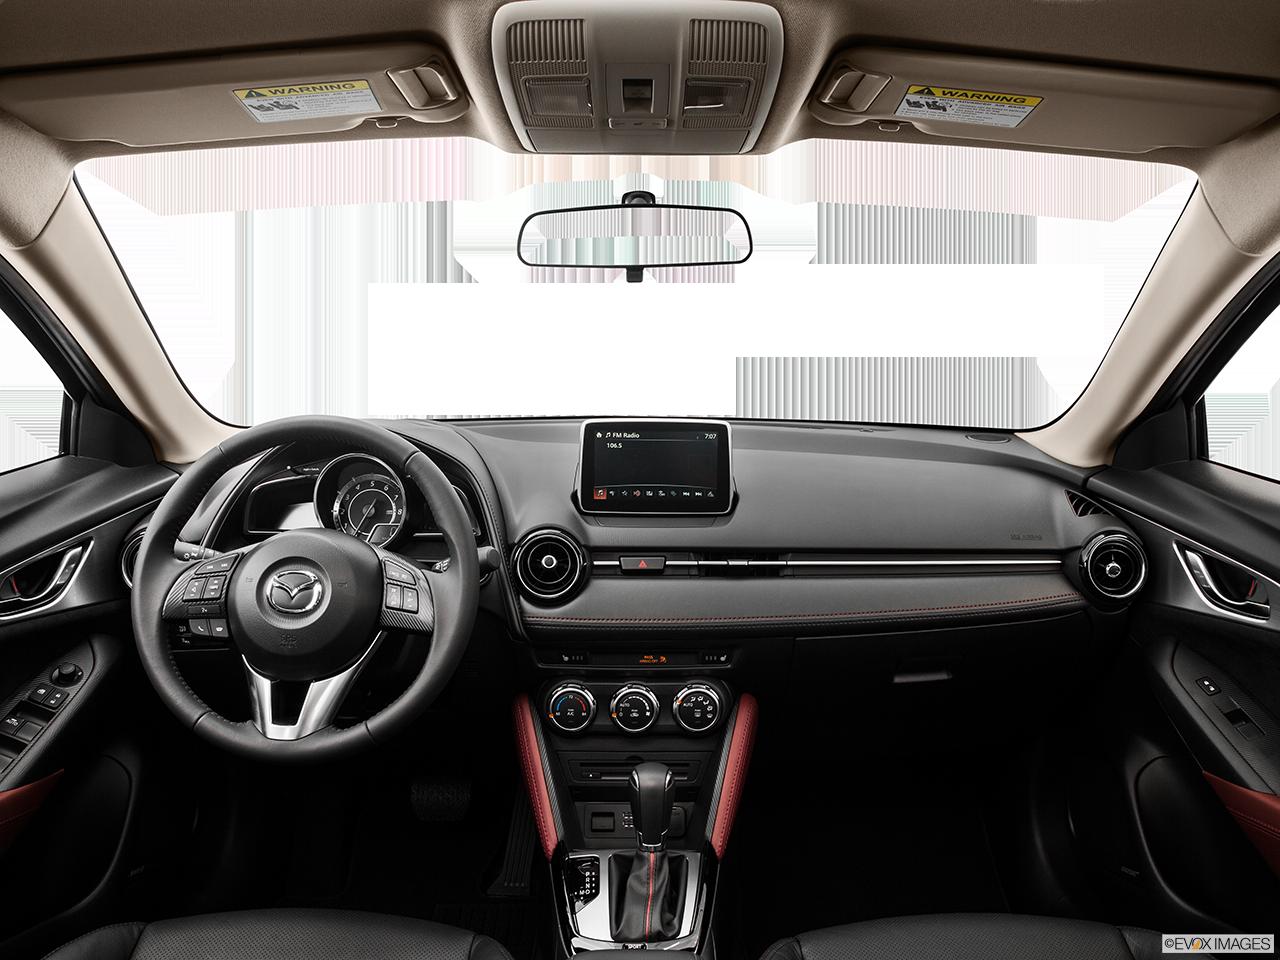 Interior View Of 2016 Mazda CX-3 in Los Angeles